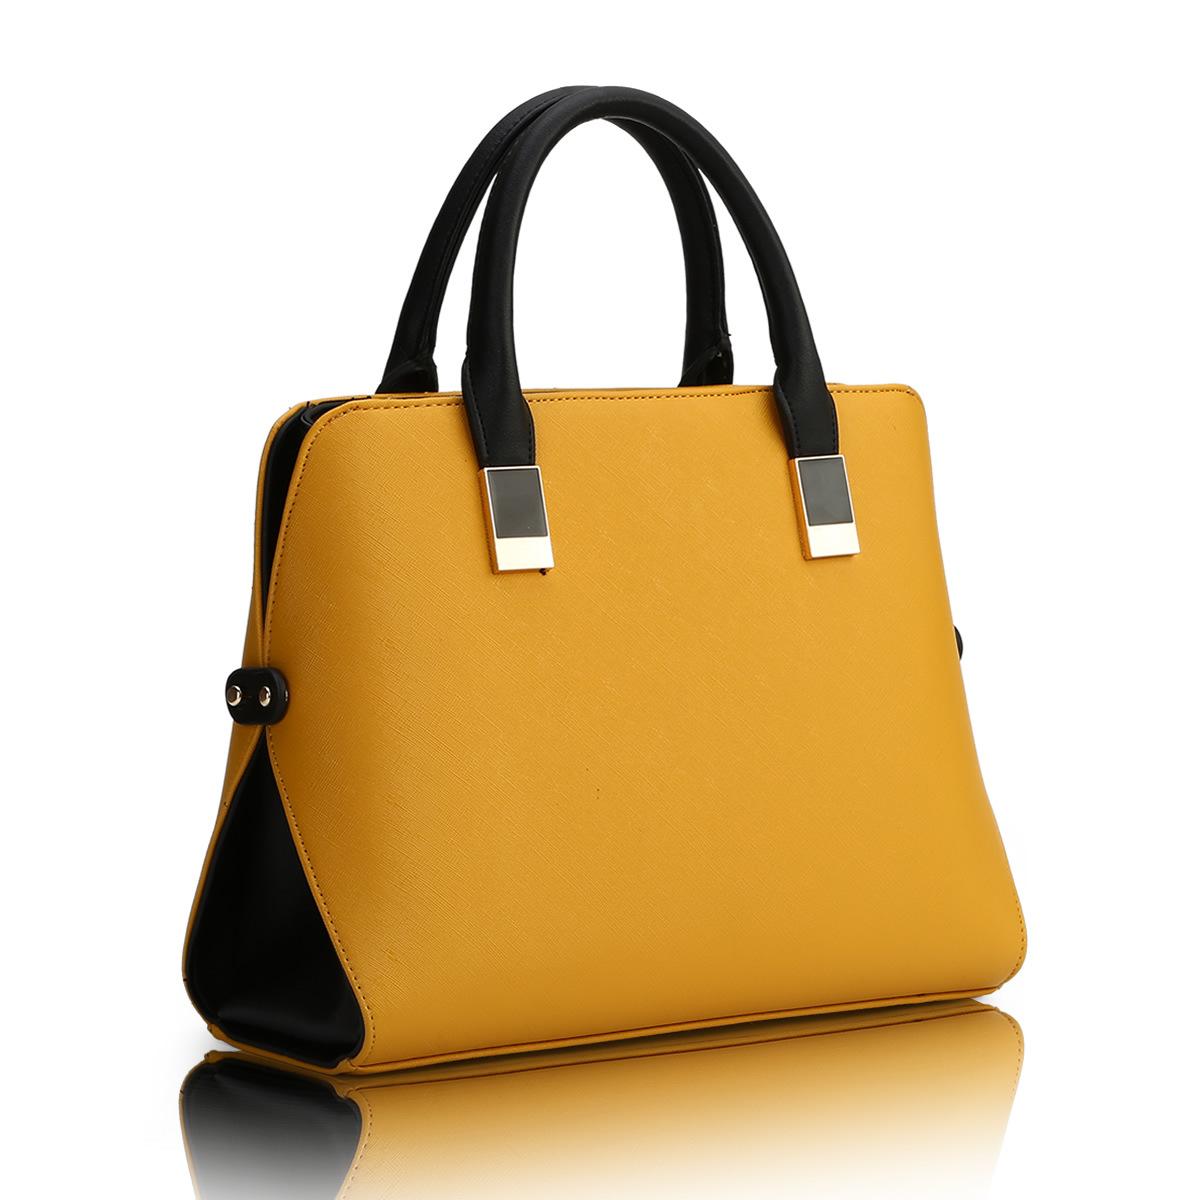 new colorfull shell casual high quality handbag brief women business shoulder bag cross-body slim female bags party bag Q5